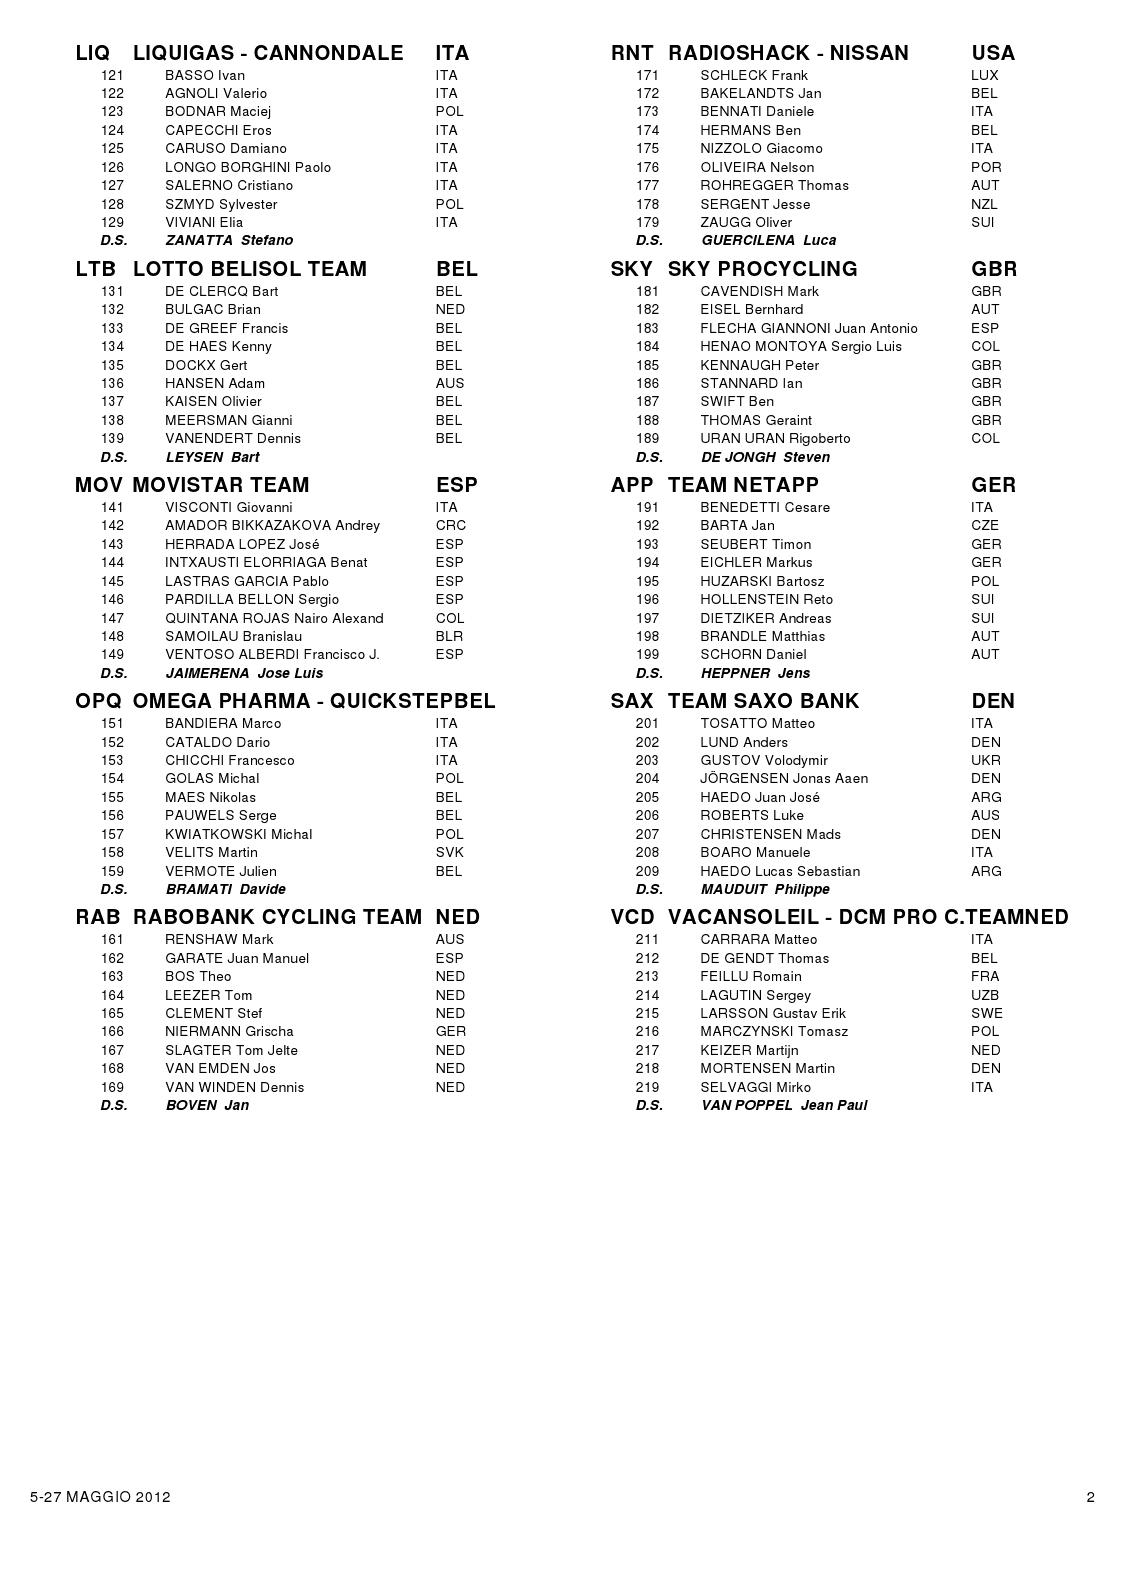 Trek Bicycle Price List